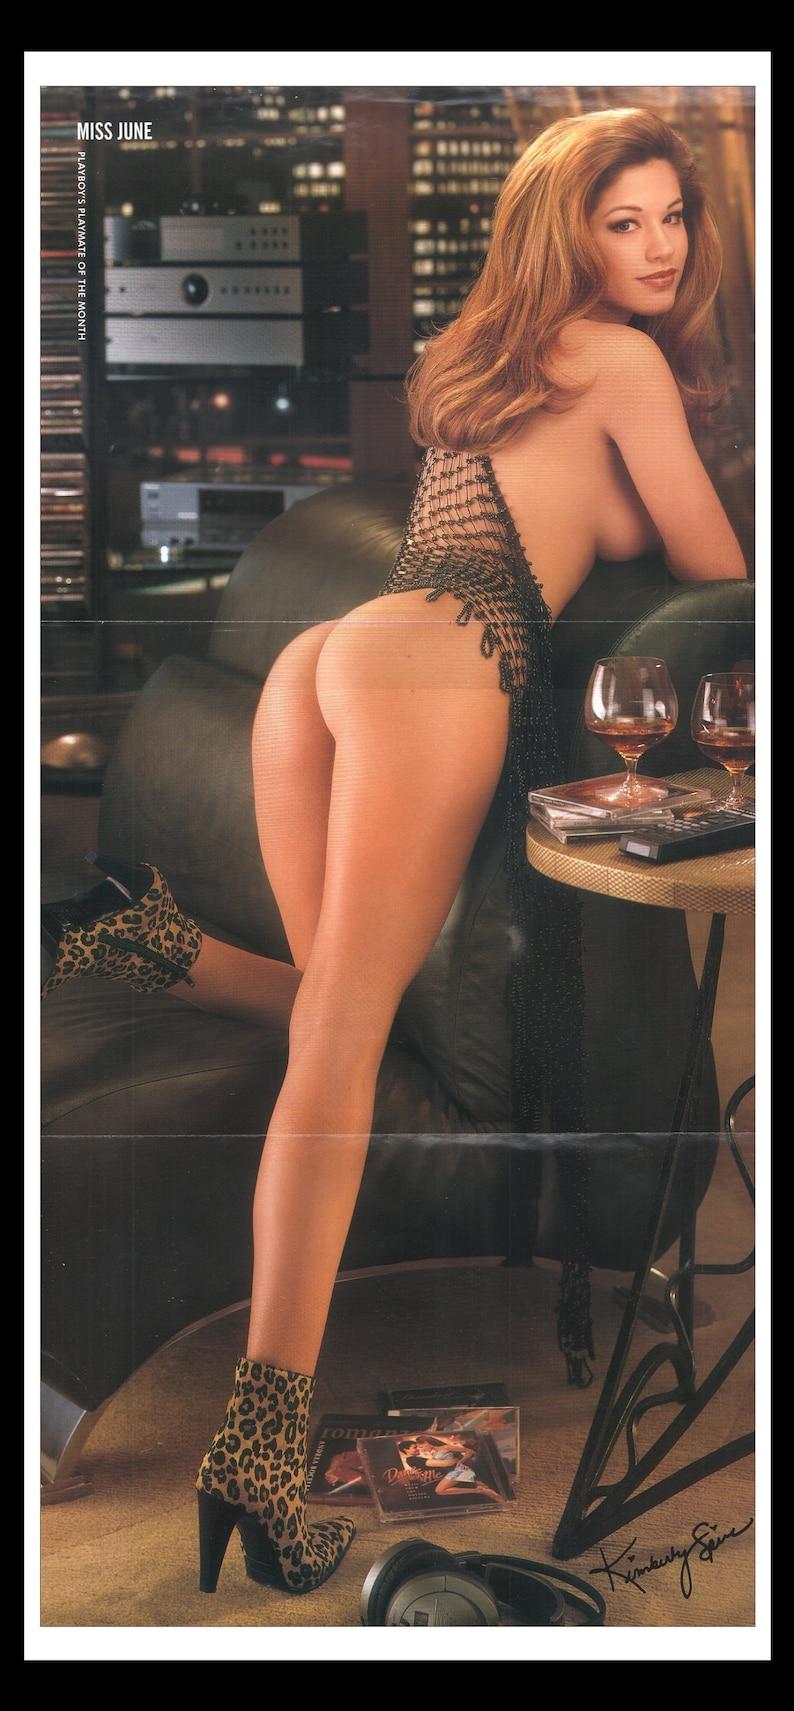 Tanga girl and boobs